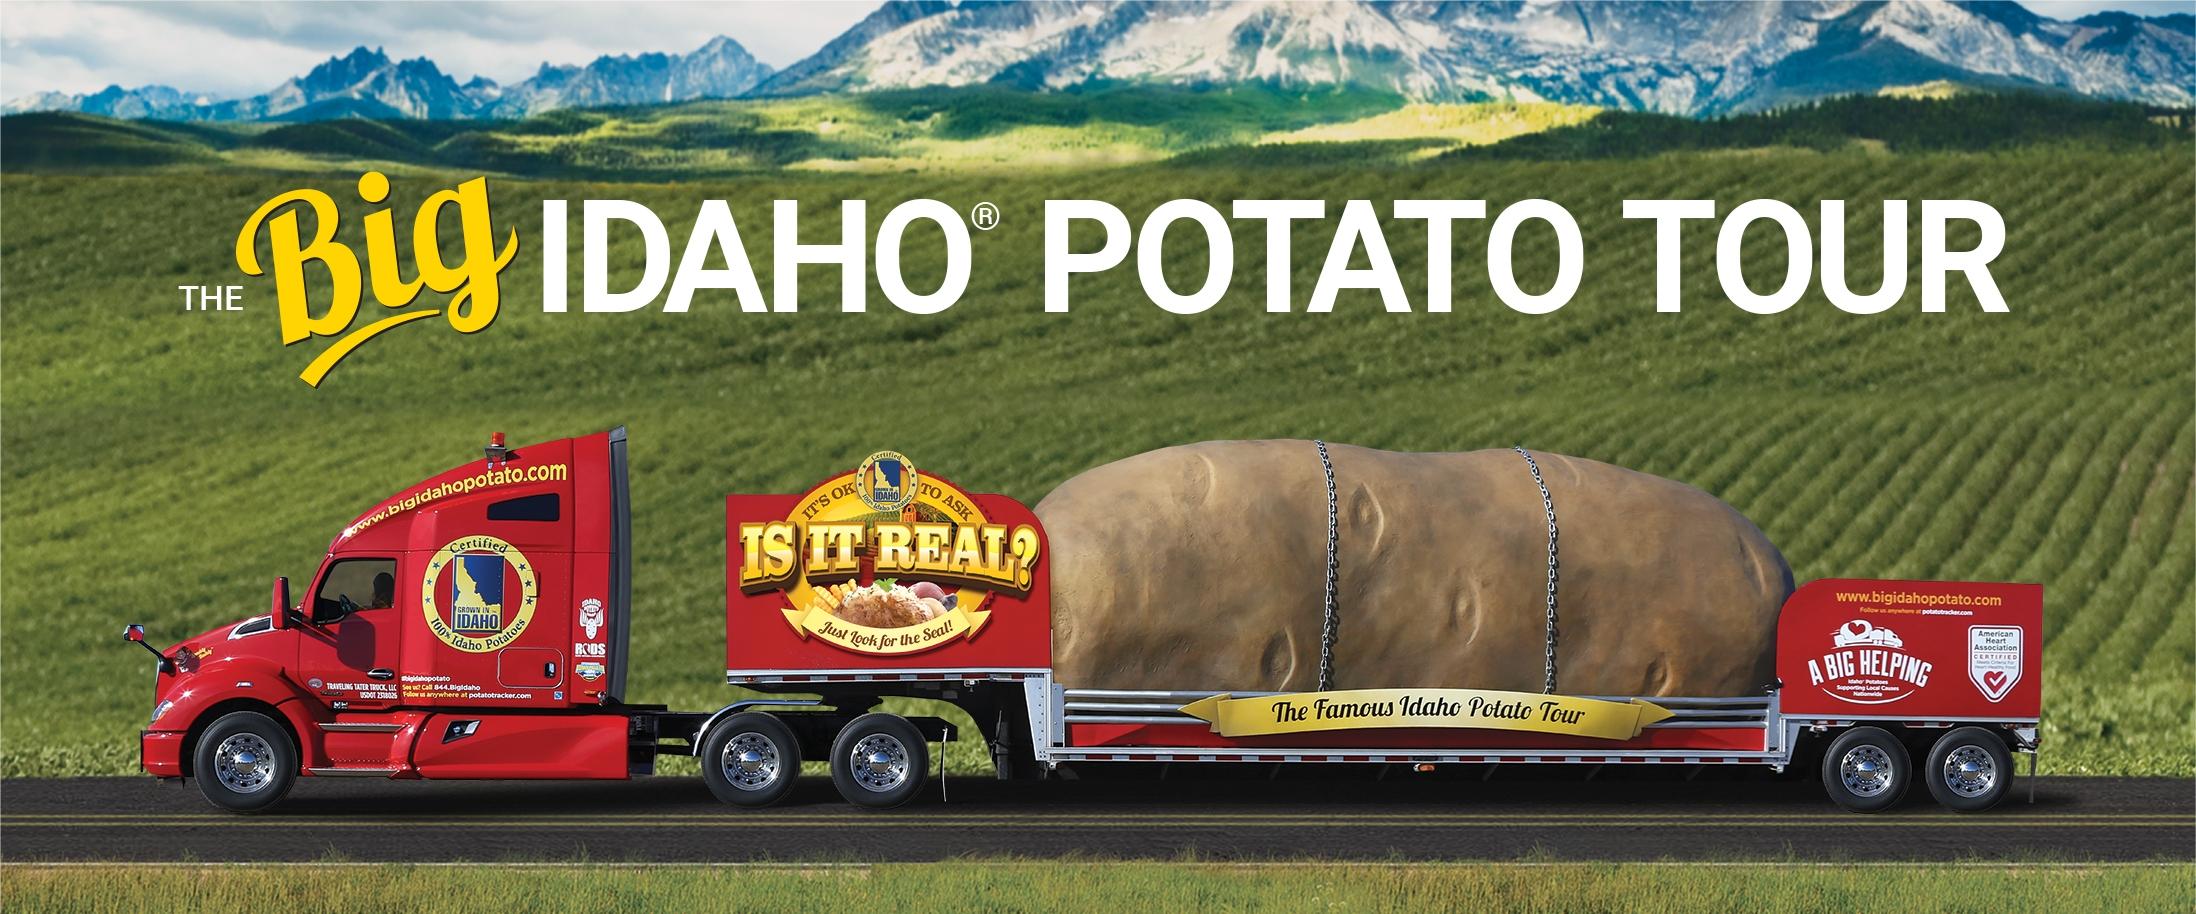 20-0210 The BIG Idaho Potato Tour